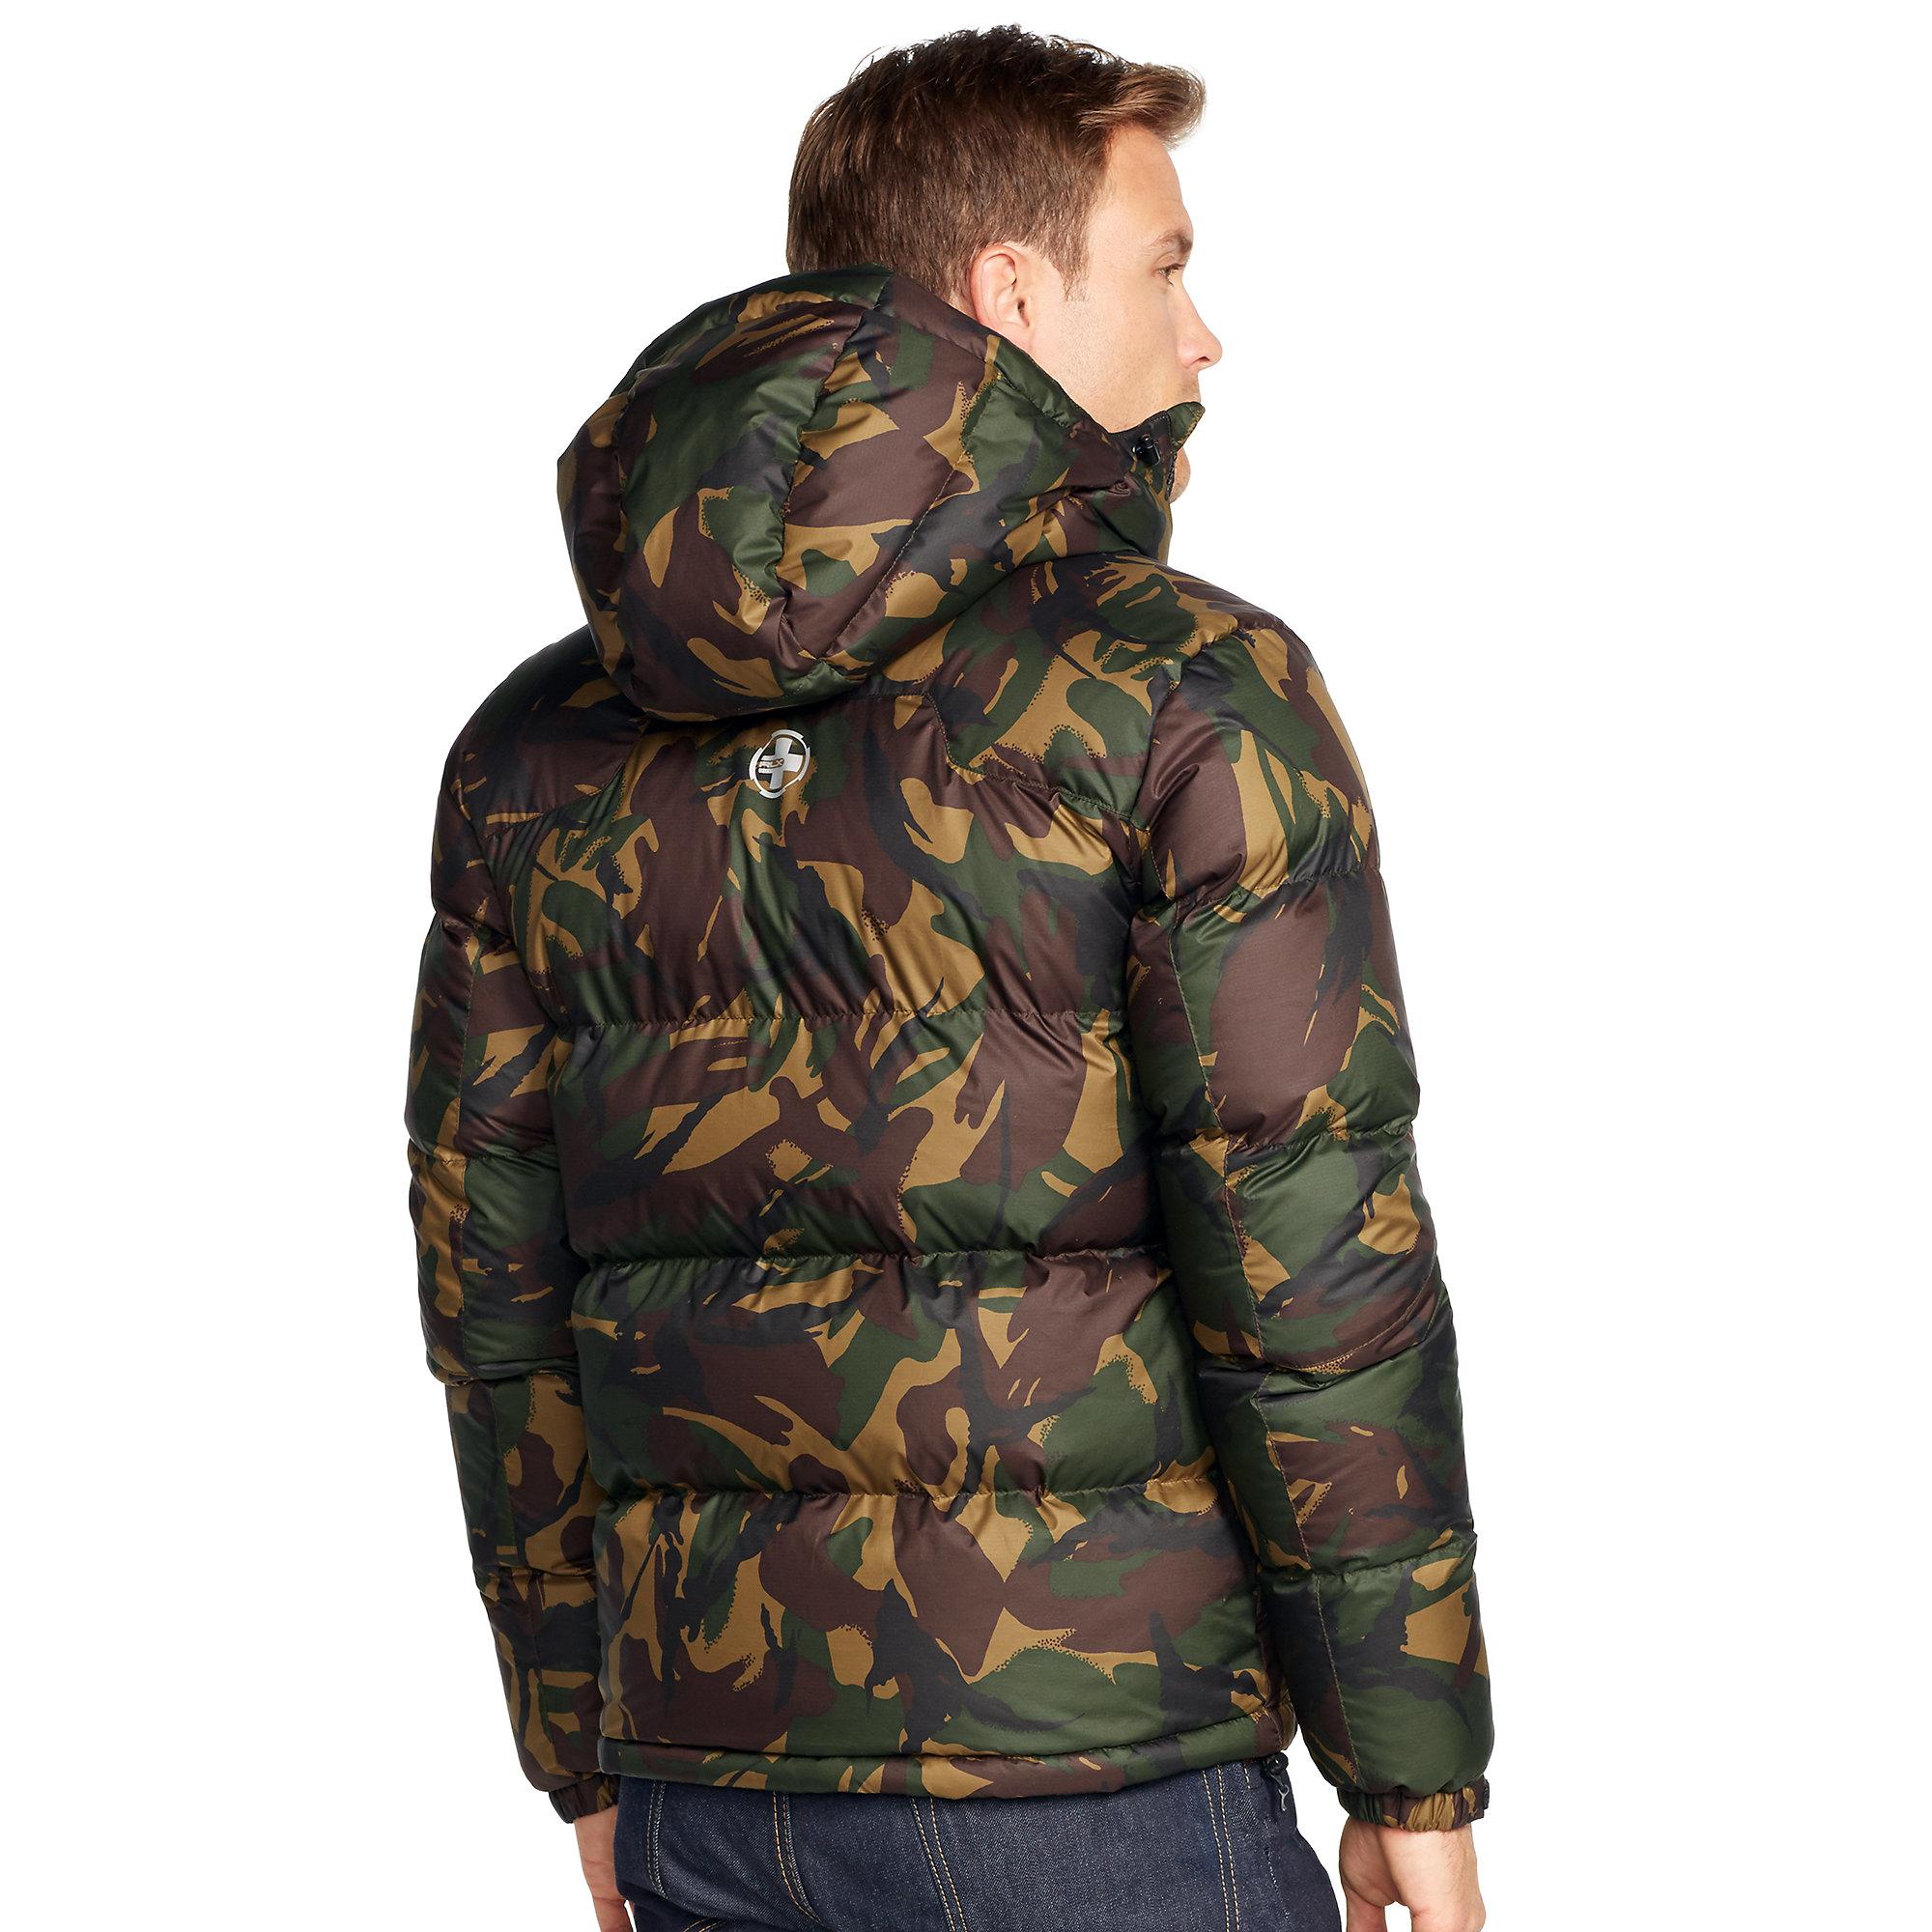 Set further Set further Ralph Lauren Camouflage Down Jacket Elmwood Camo 1 also Set as well Thing. on oscar de la renta jacket men